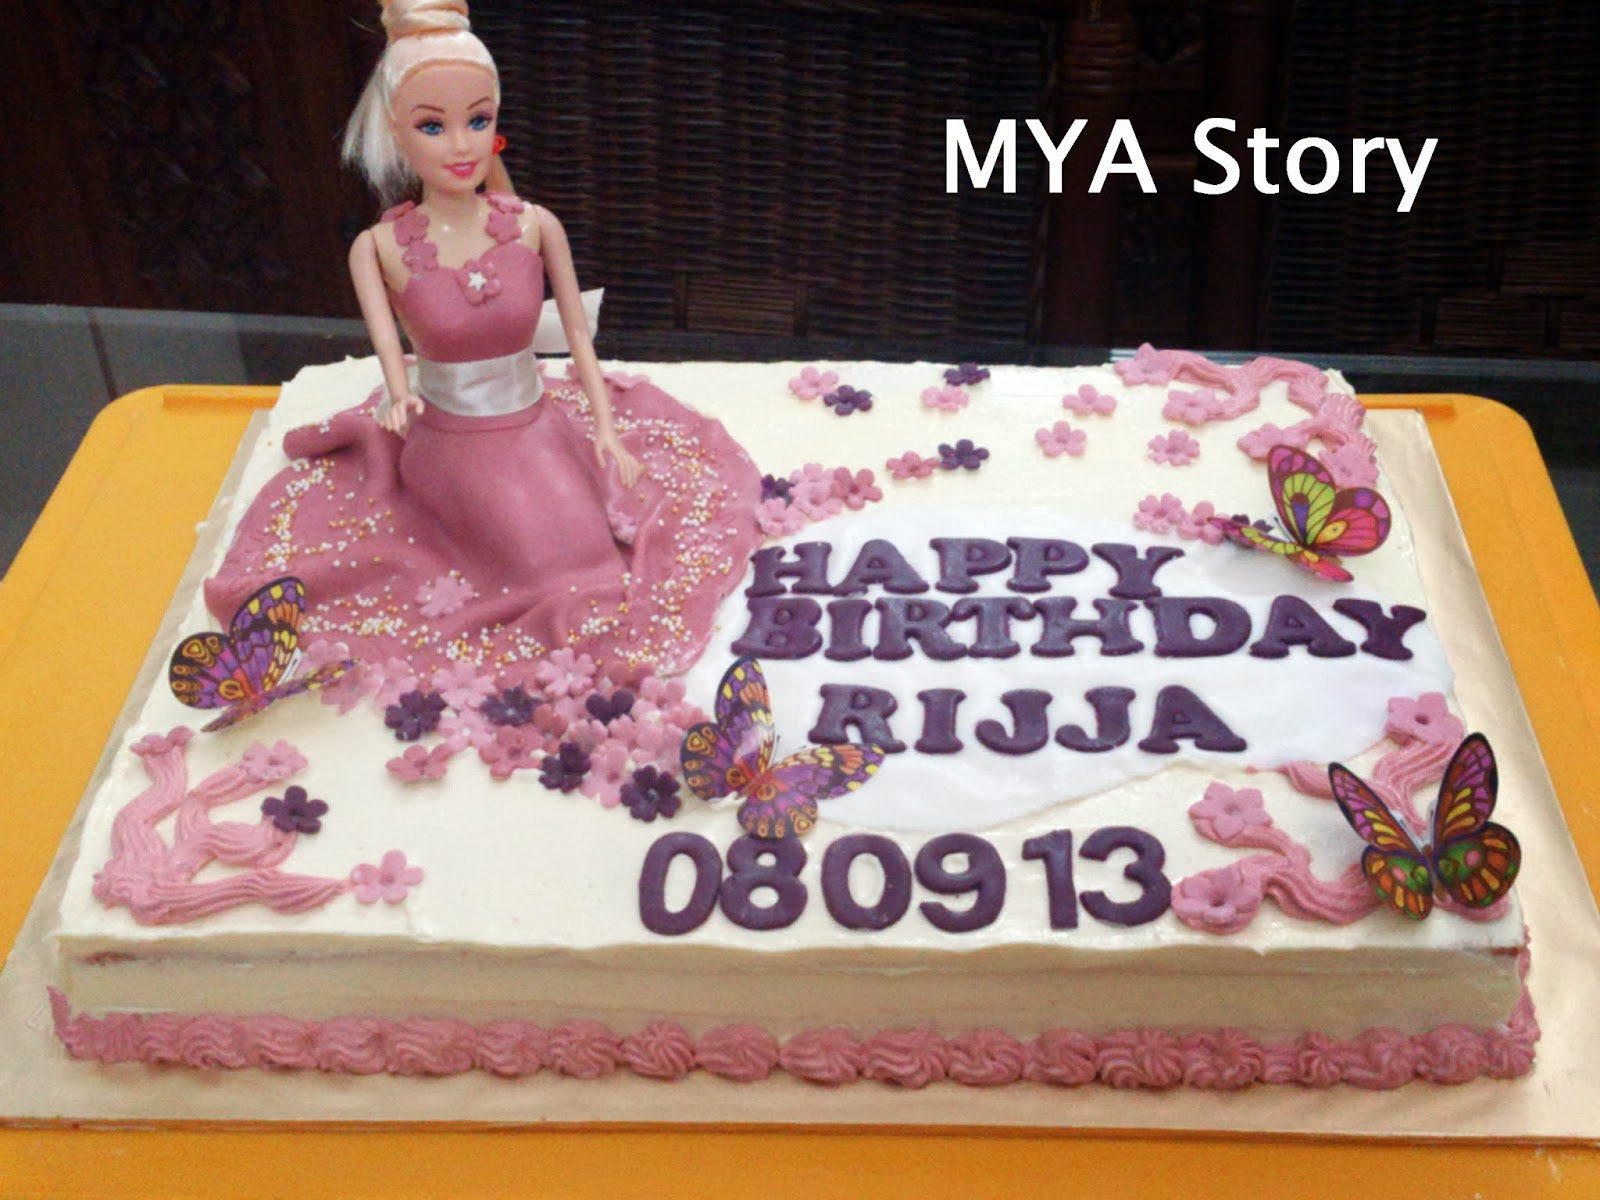 Remarkable Mya Scrap Book Princess Doll Birthday Cake For Lil Rijja Birthday Cards Printable Riciscafe Filternl